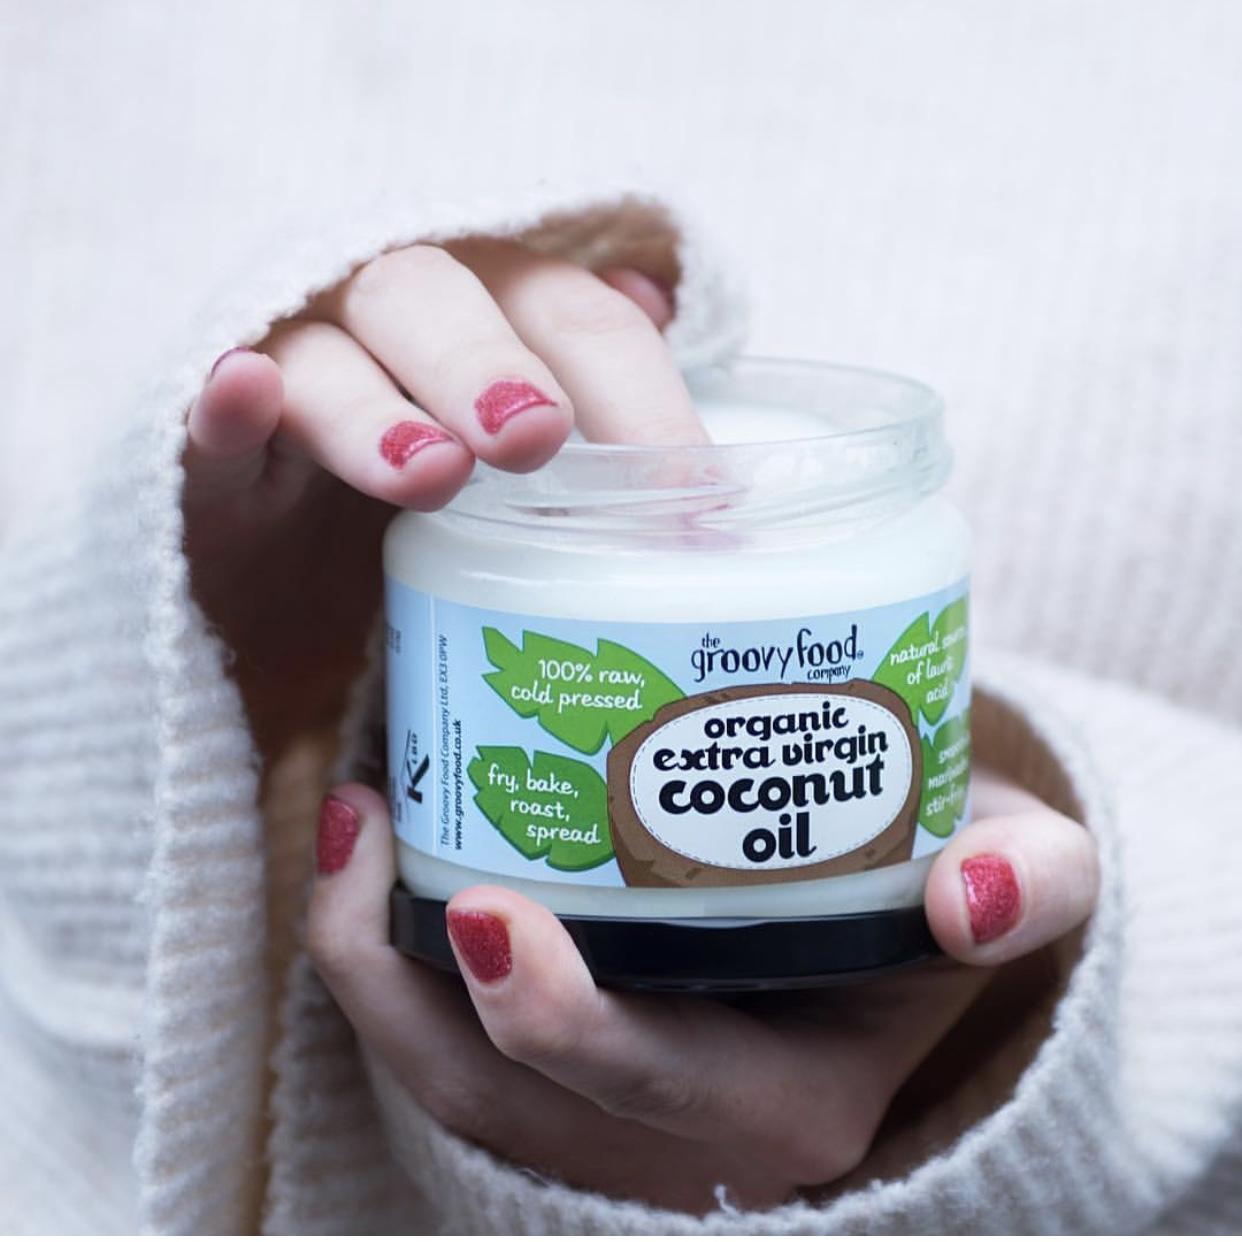 The Groovy Food Company Organic extra virgin Coconut oil